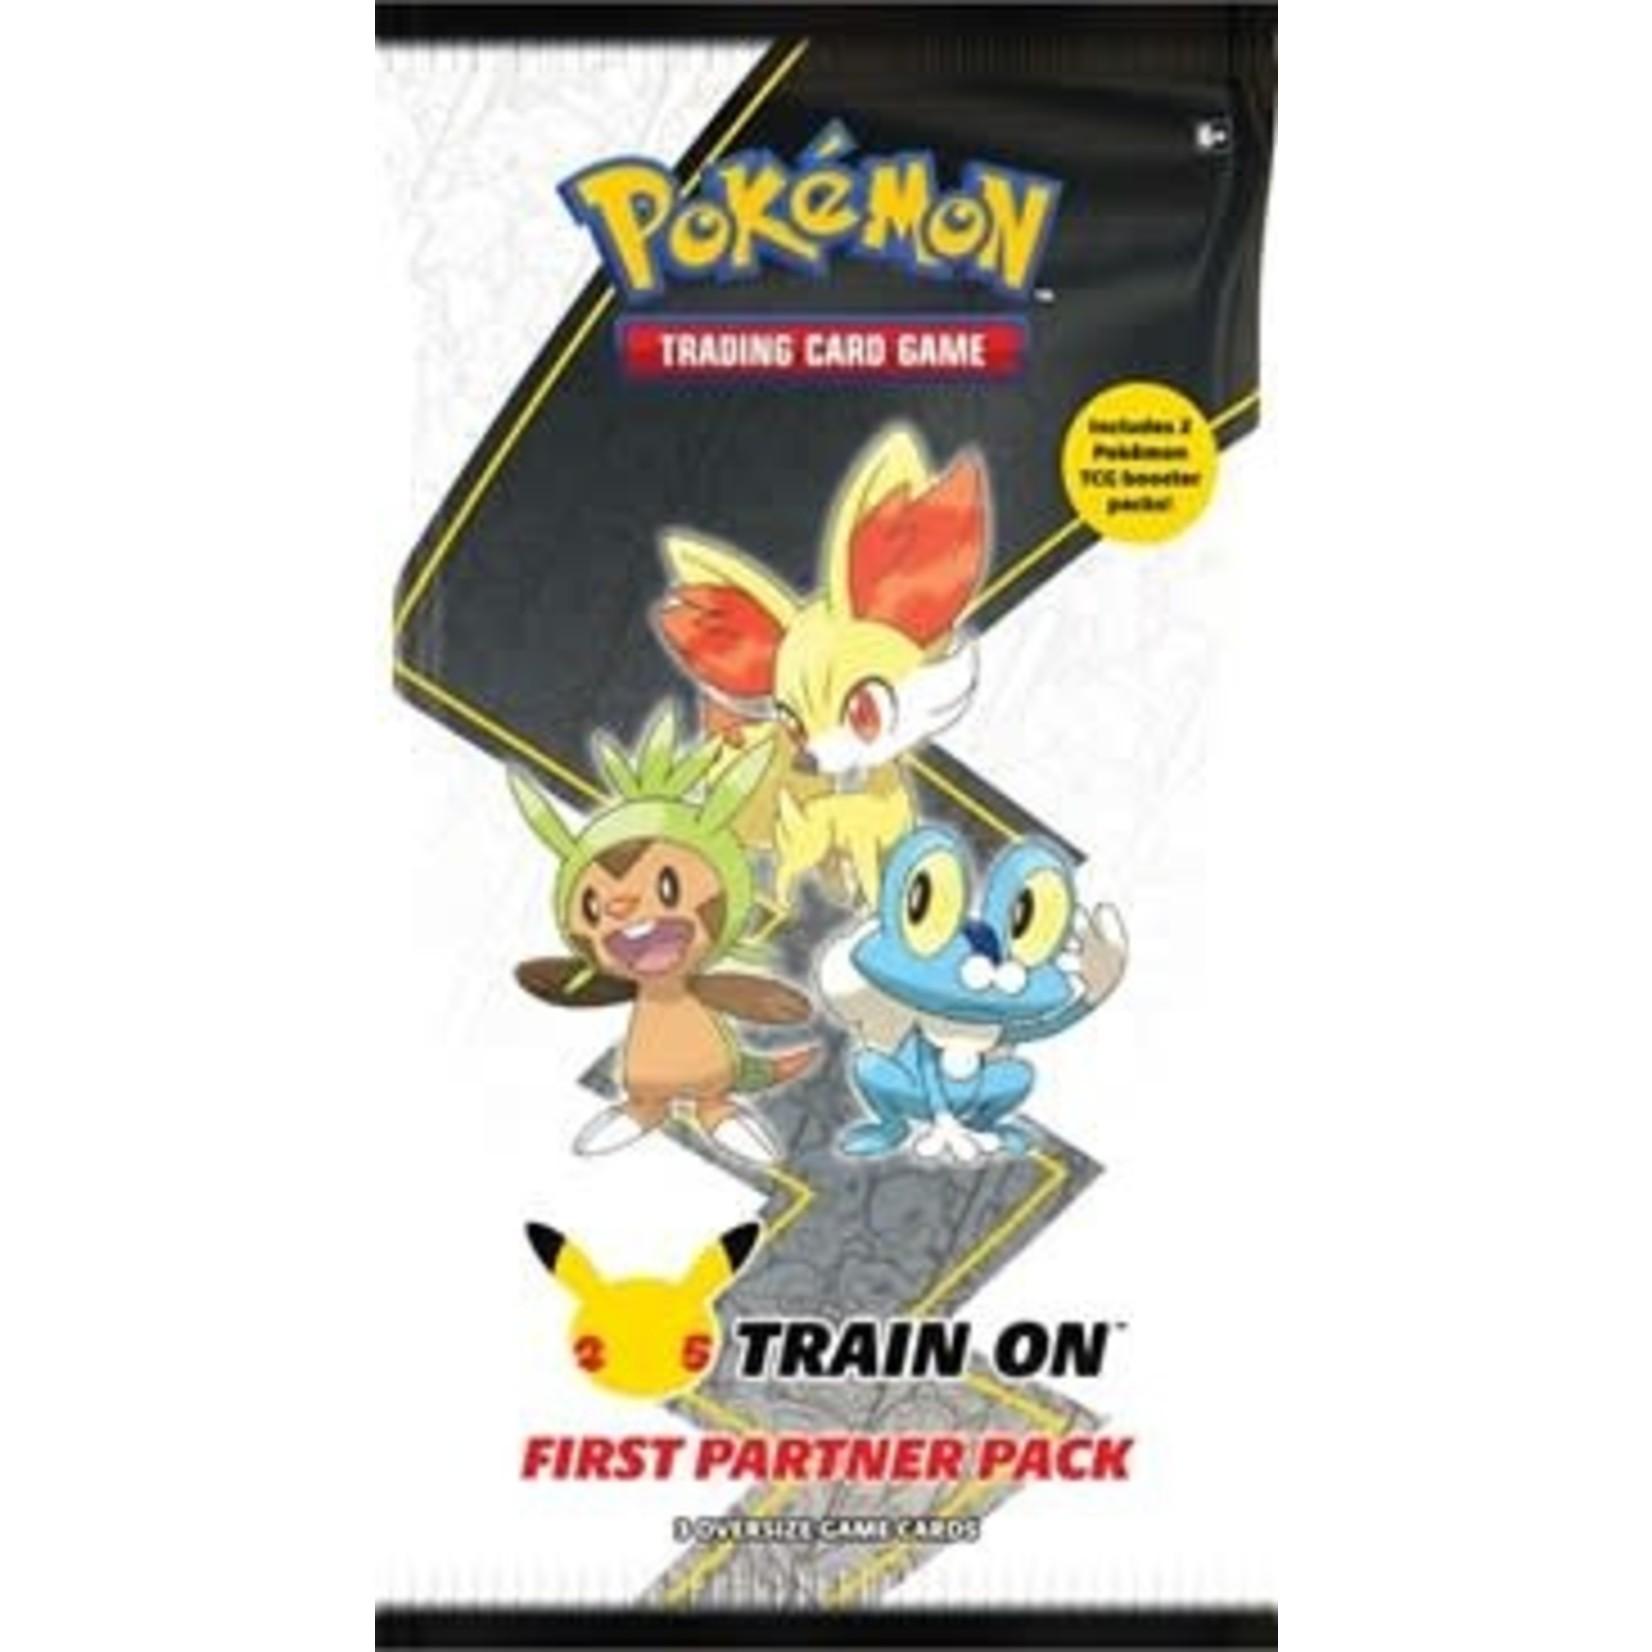 Pokémon Pokémon TCG: First Partner Pack: Kalos